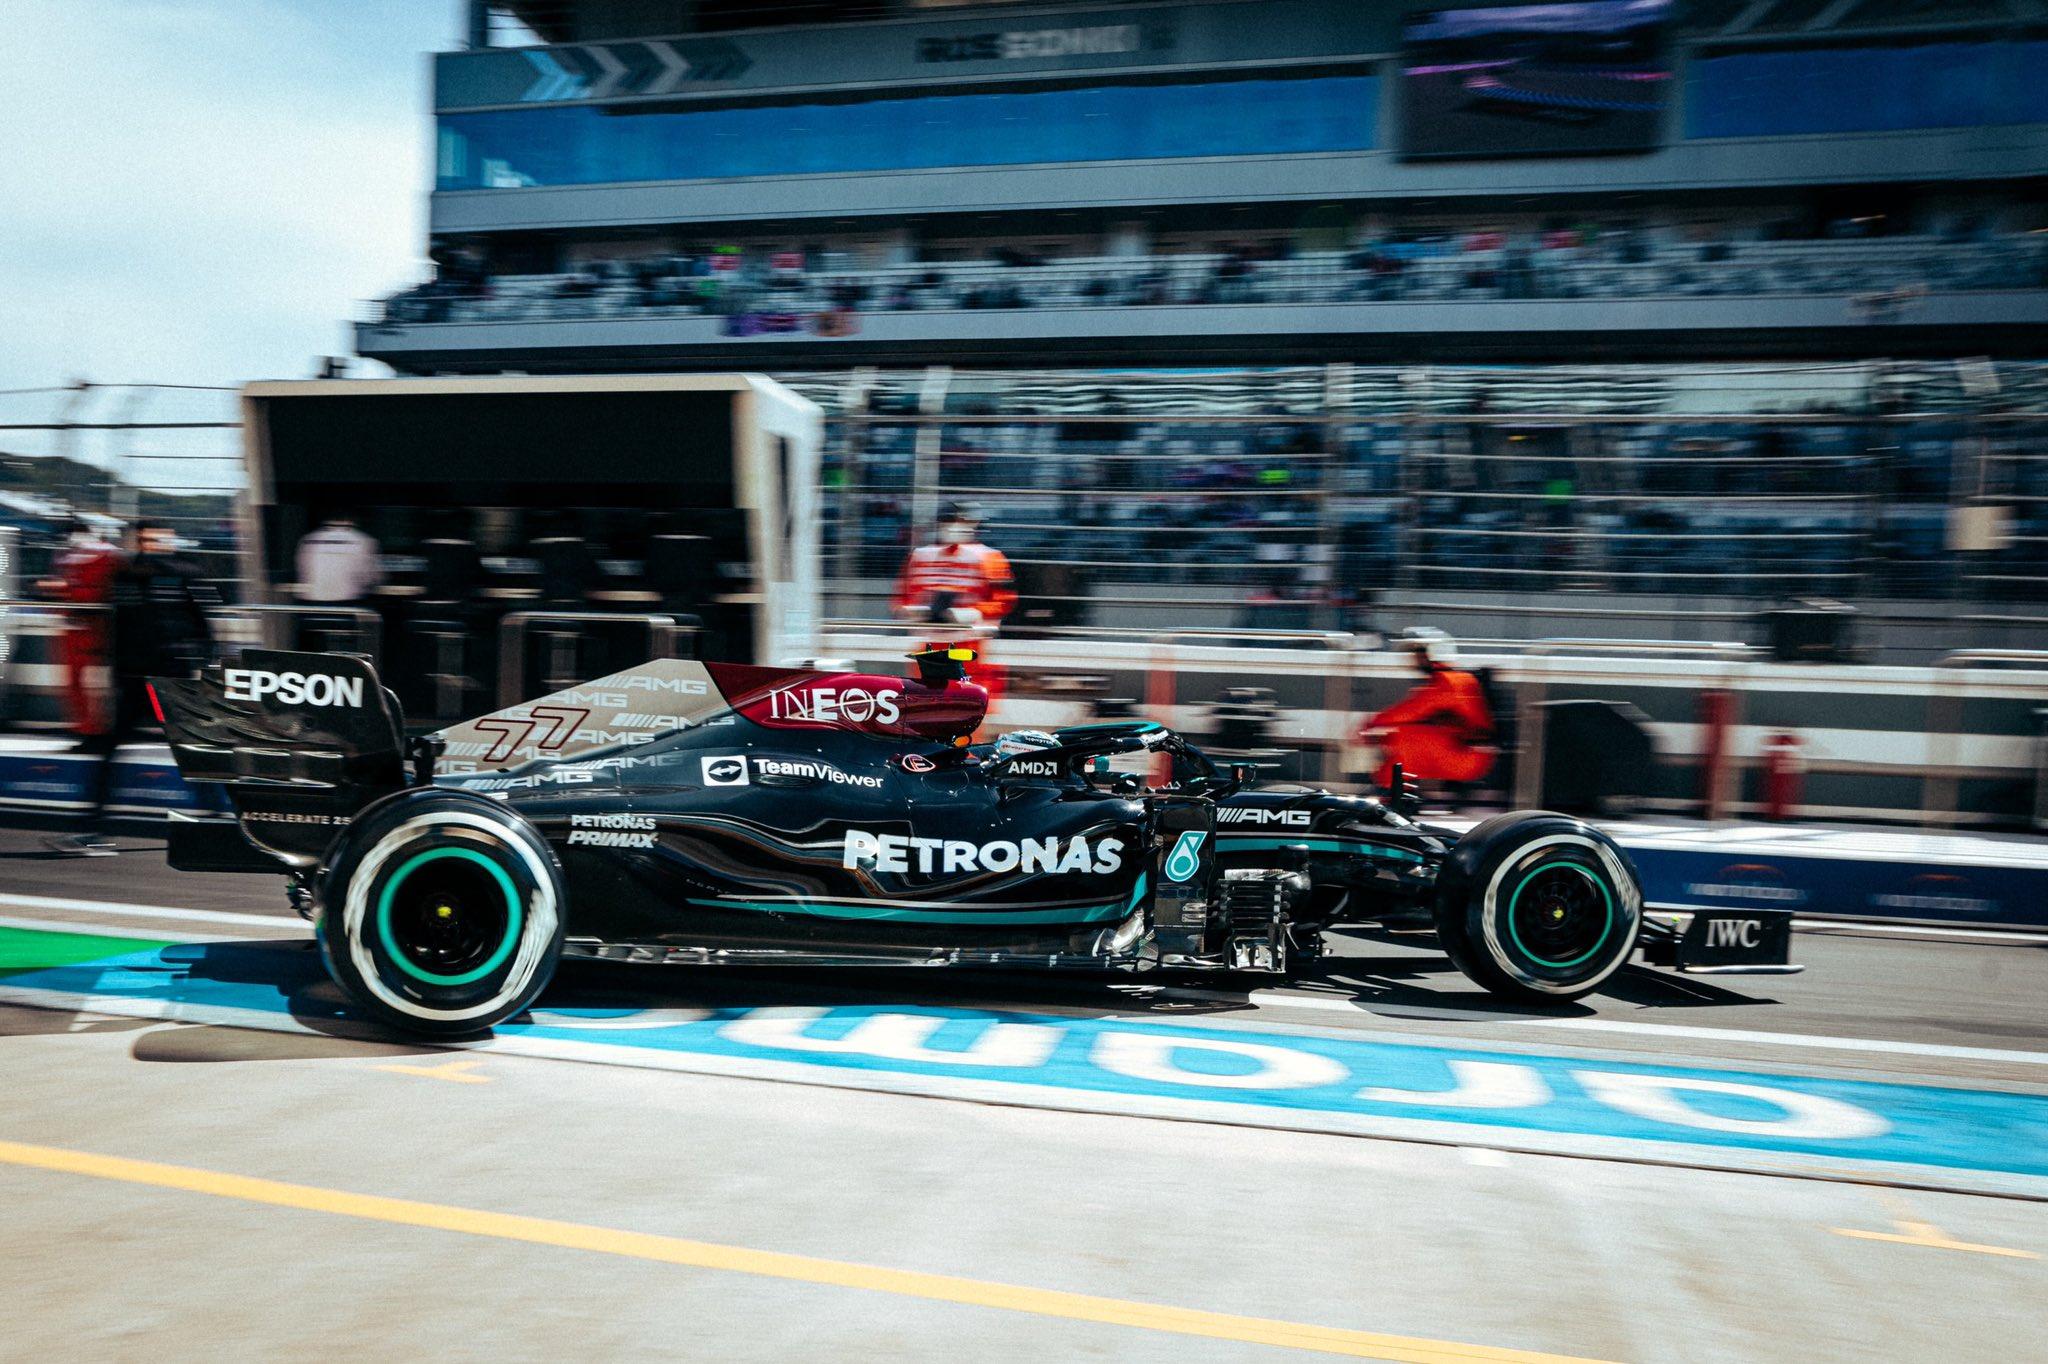 F1 - GP de Russie - EL1 : Valtteri Bottas mène un doublé Mercedes à Sotchi